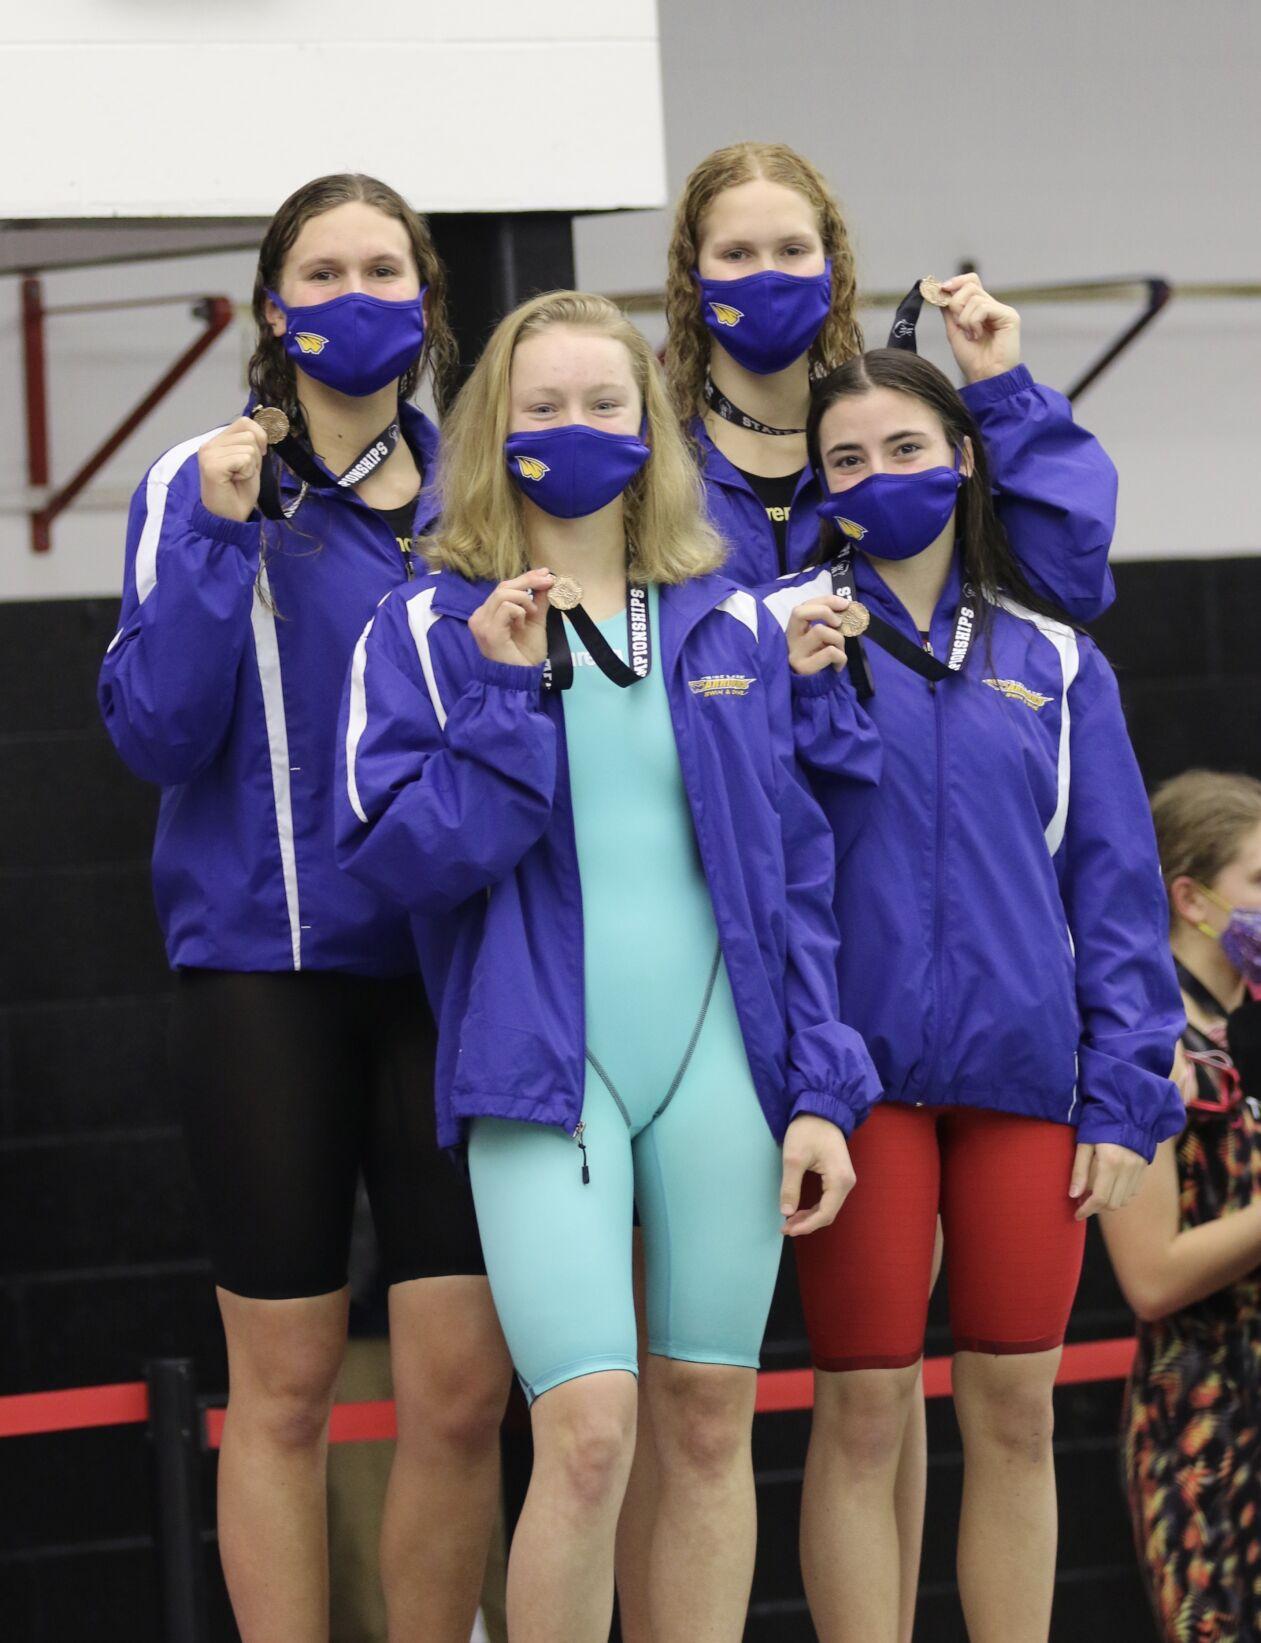 Rice Lake swim 200 freestyle relay